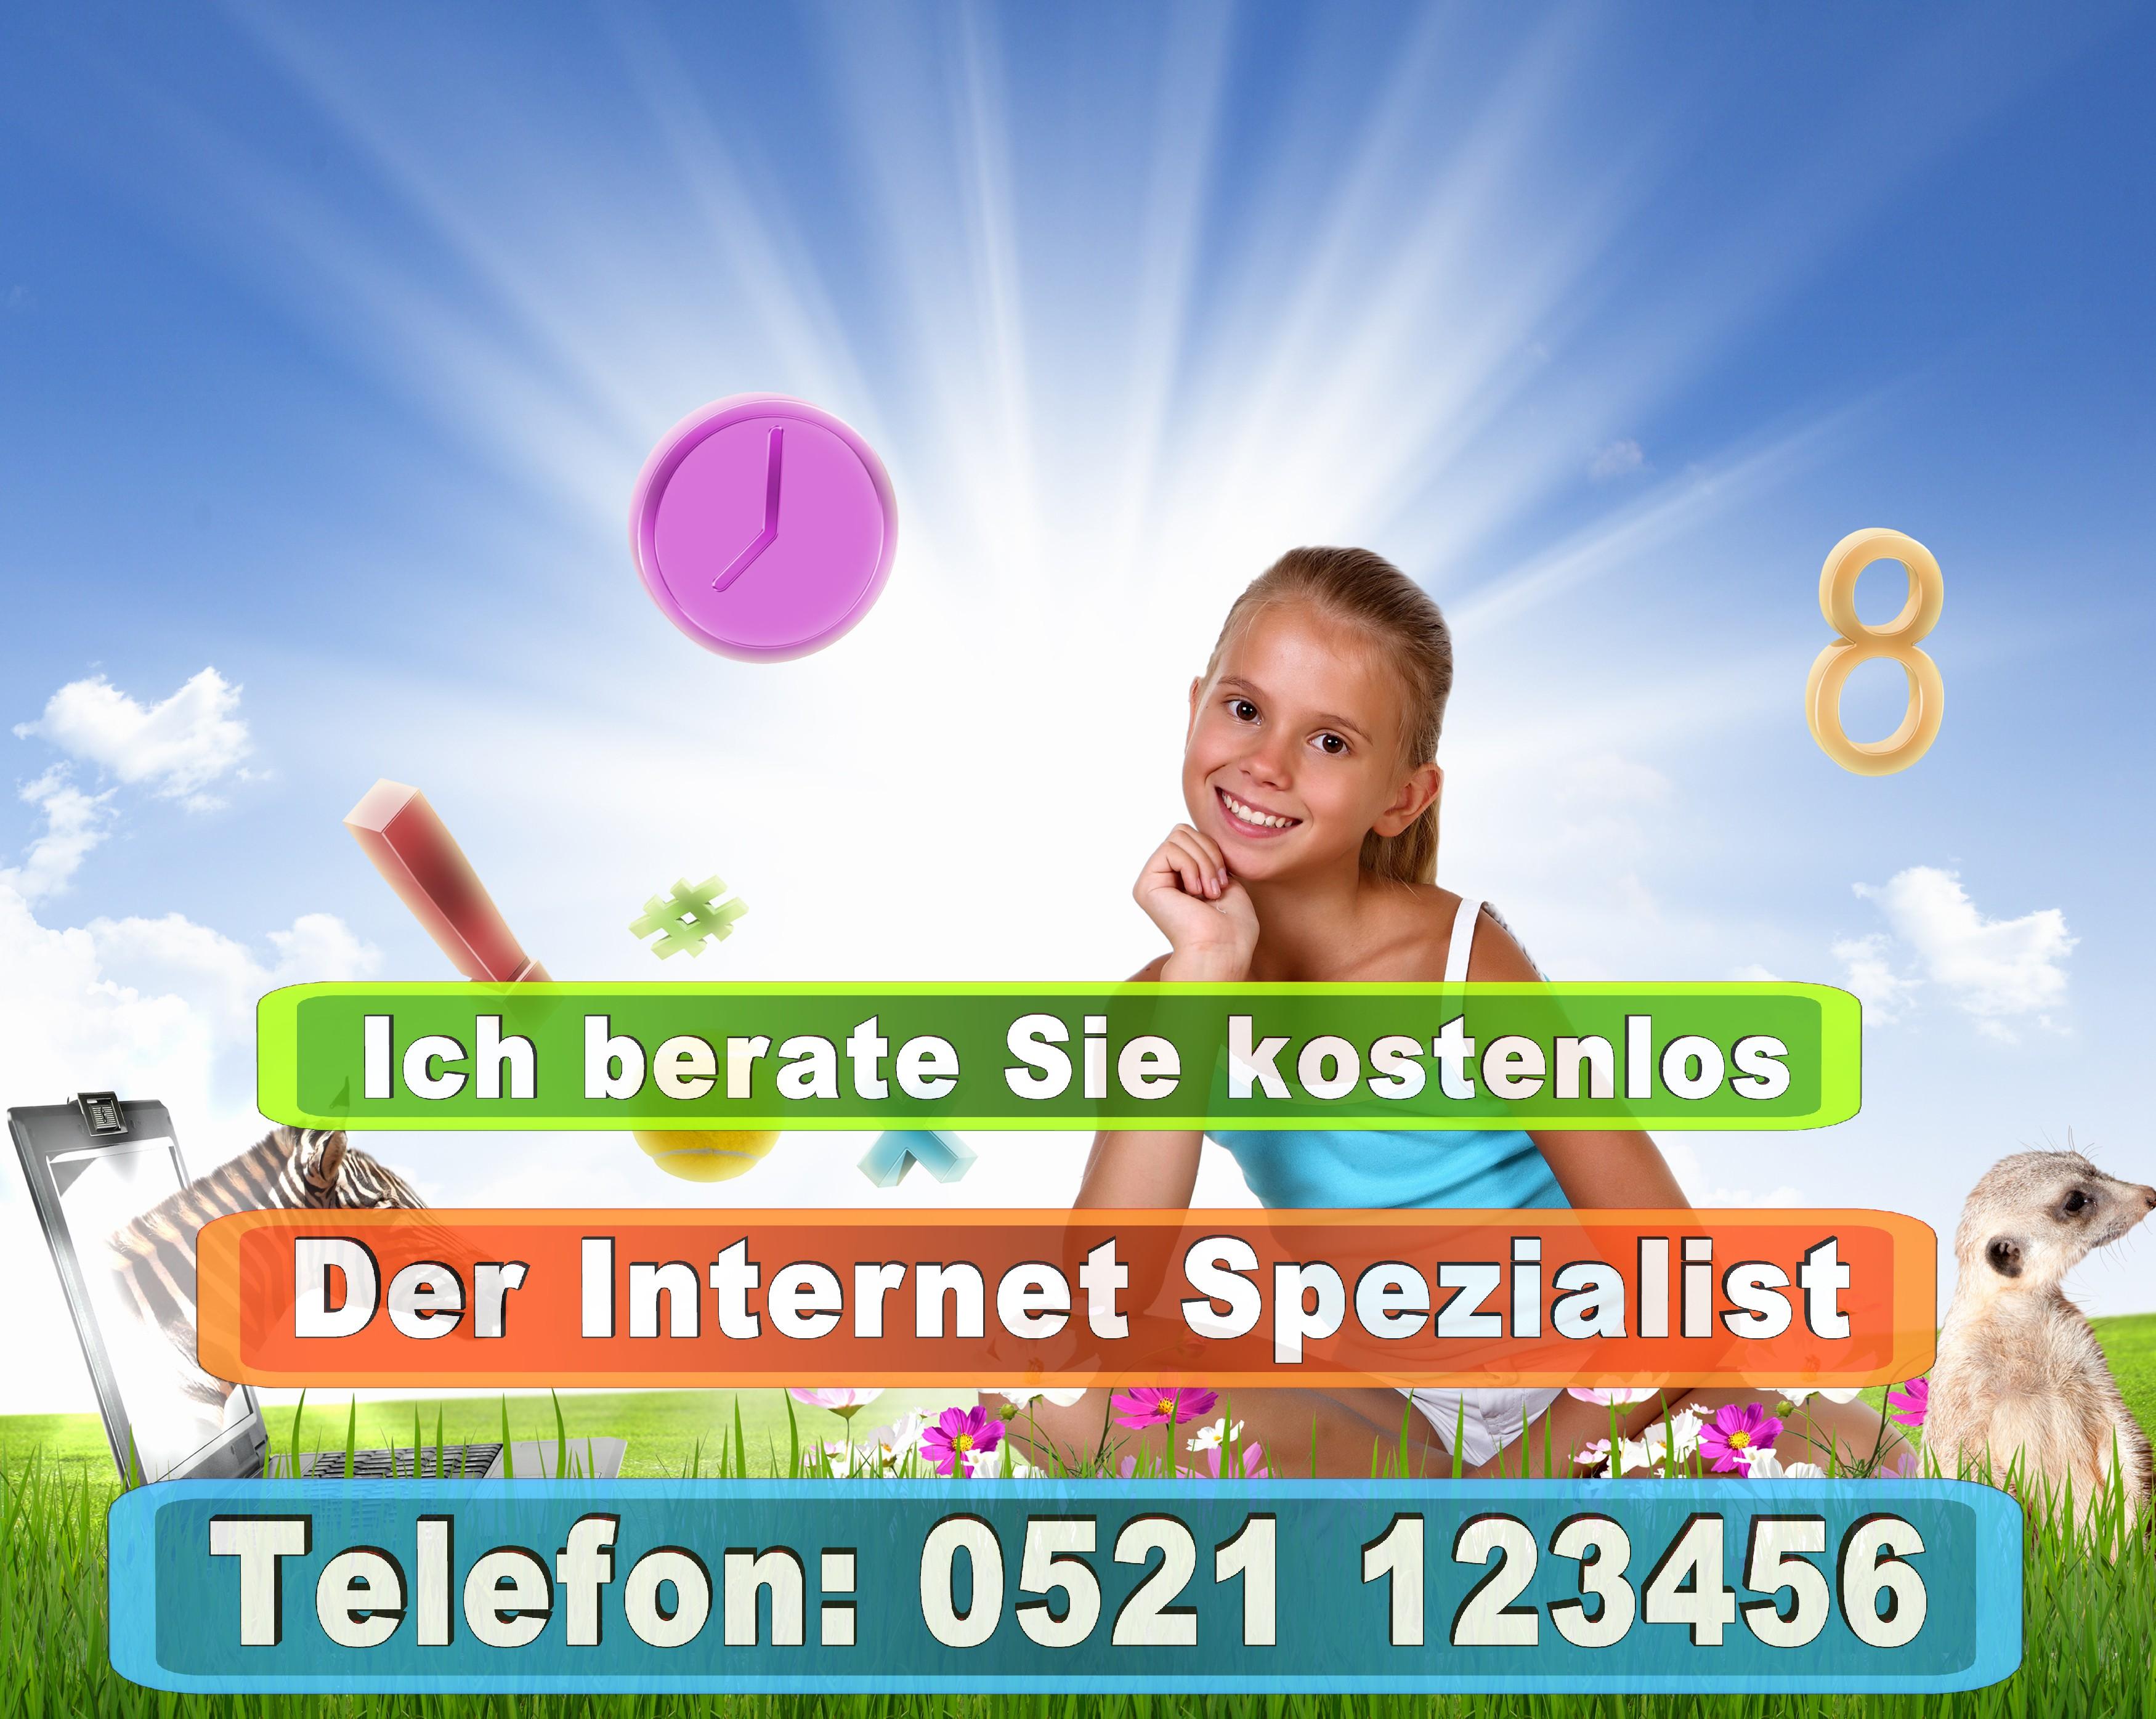 Schulen Bielefeld Schule Grundschule Sonderschule Hauptschule Realschule Schulhof Turnhalle Sporthalle Bielefeld NRW (11)